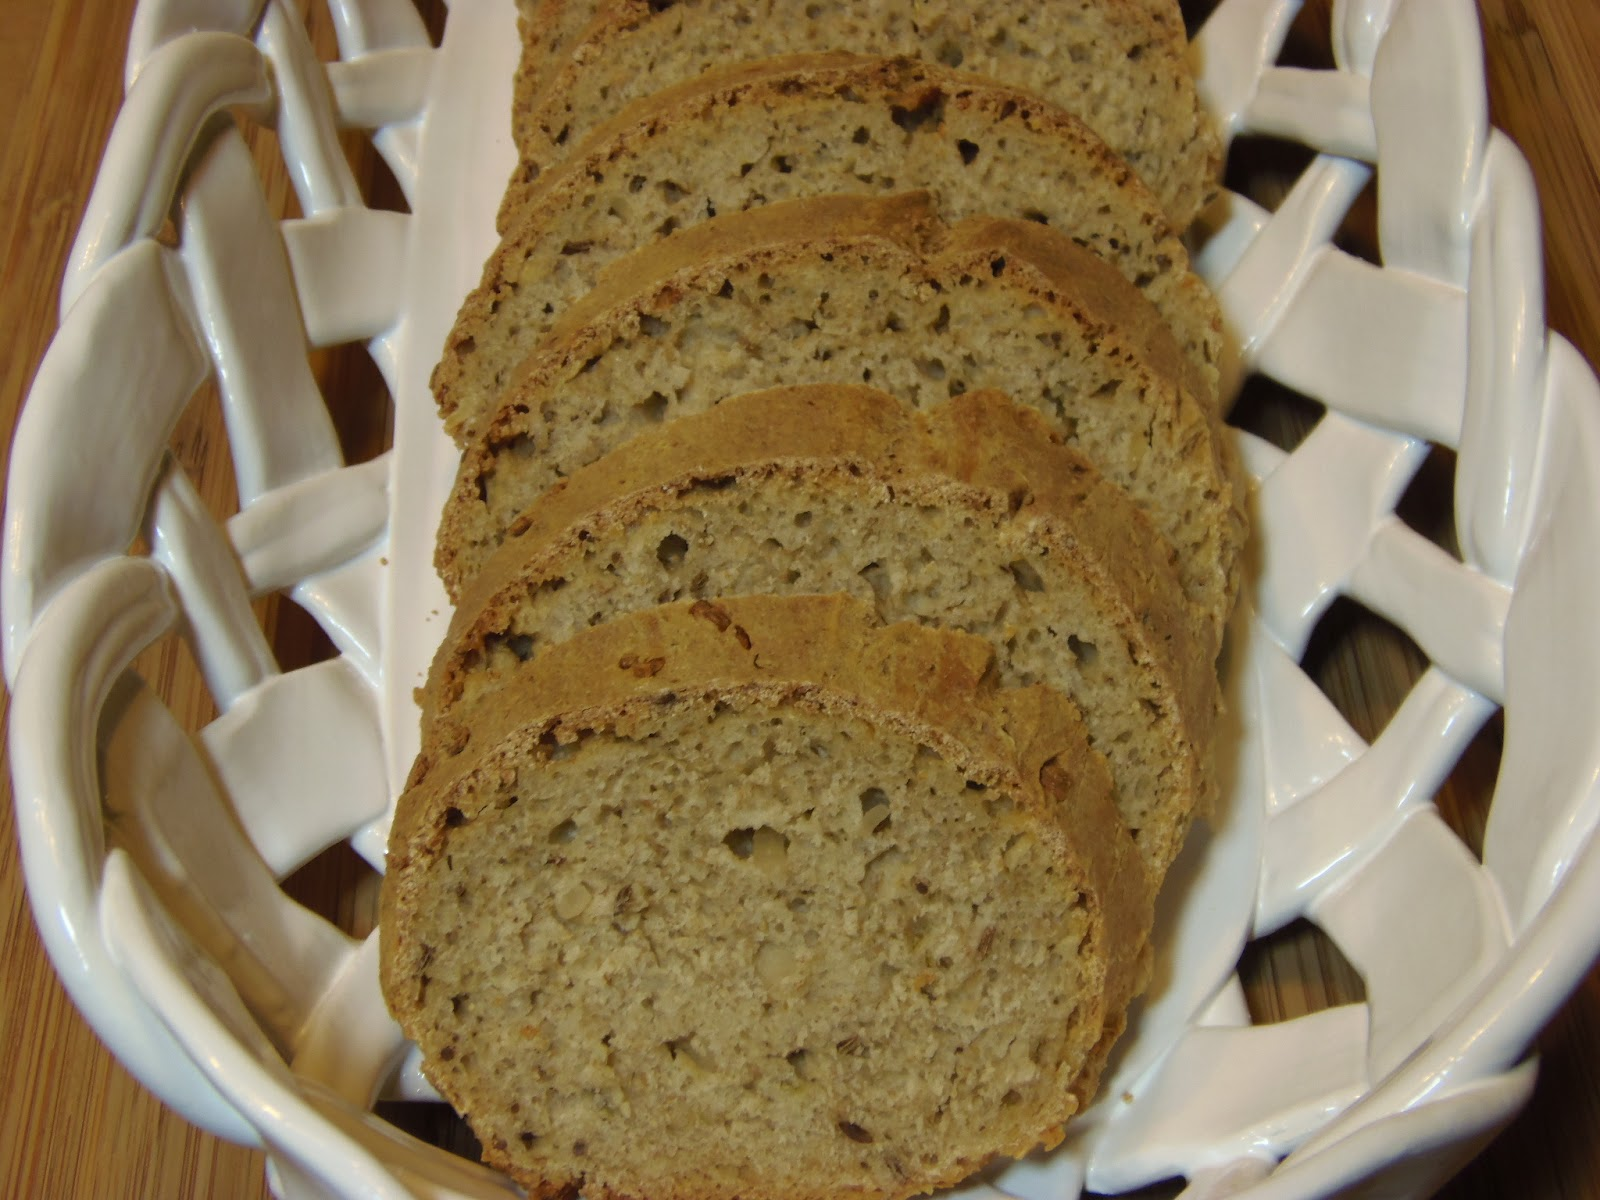 Kudos Kitchen By Renee: St. Patrick's Day Sourdough Rye Bread